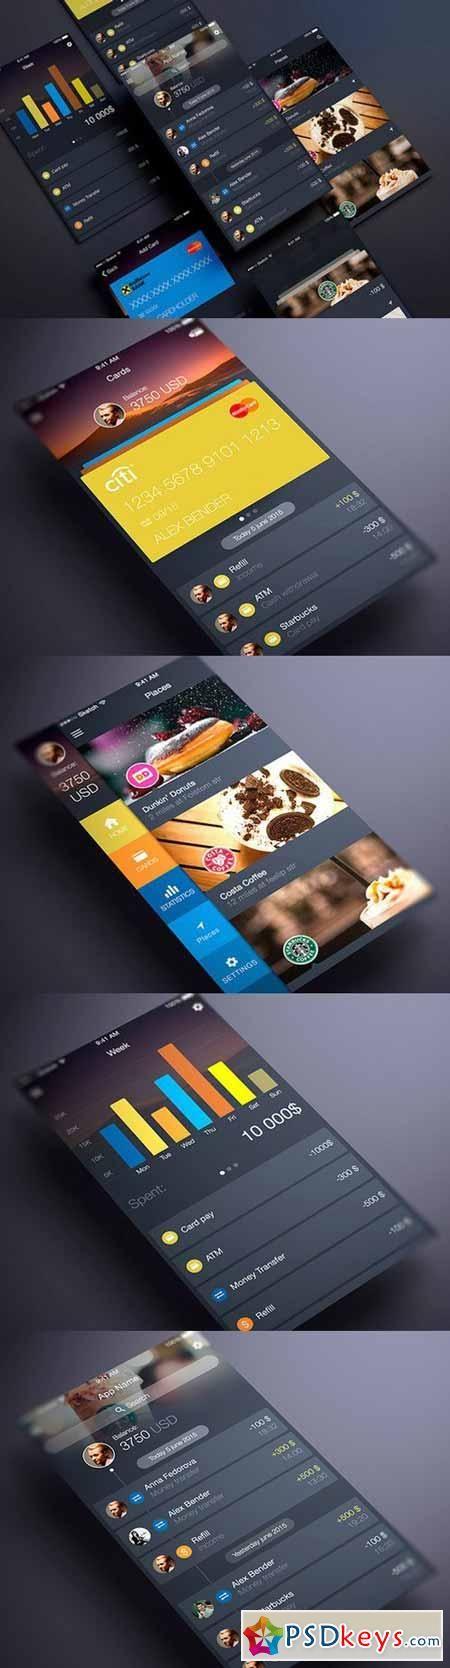 Finance App UI 297845